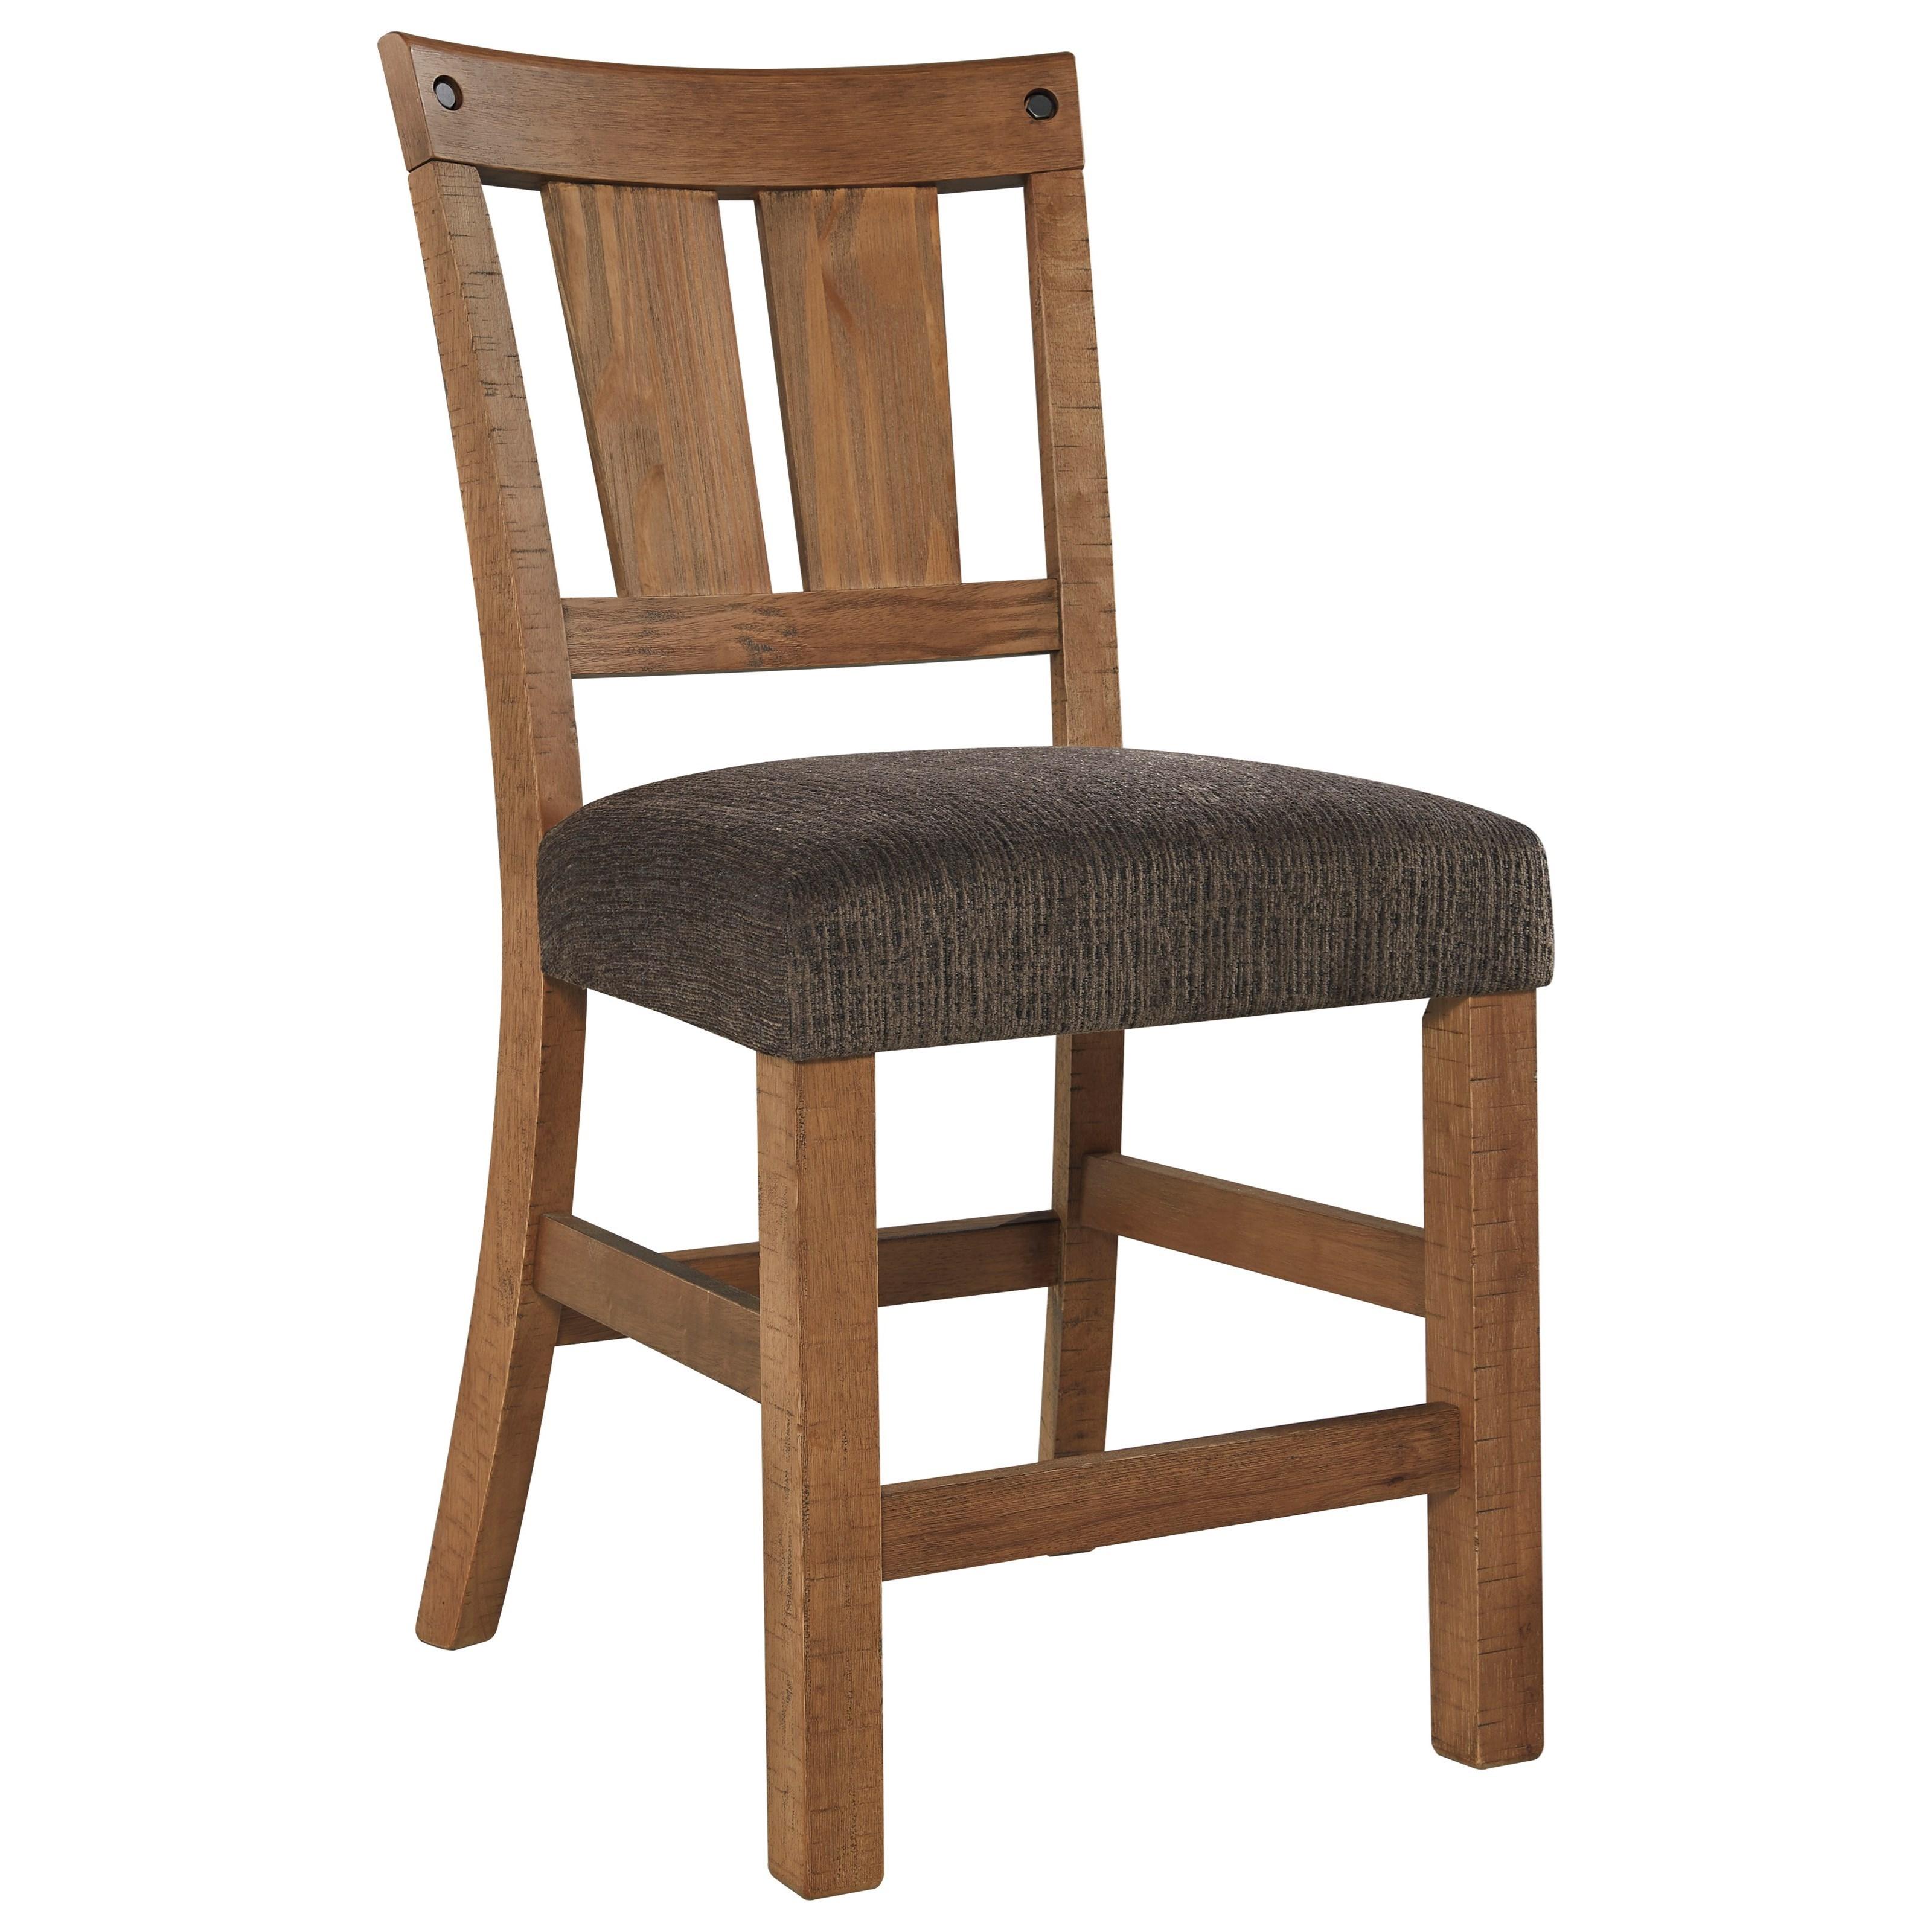 Ashley signature design tamilo d714 124 upholstered for Furniture 124